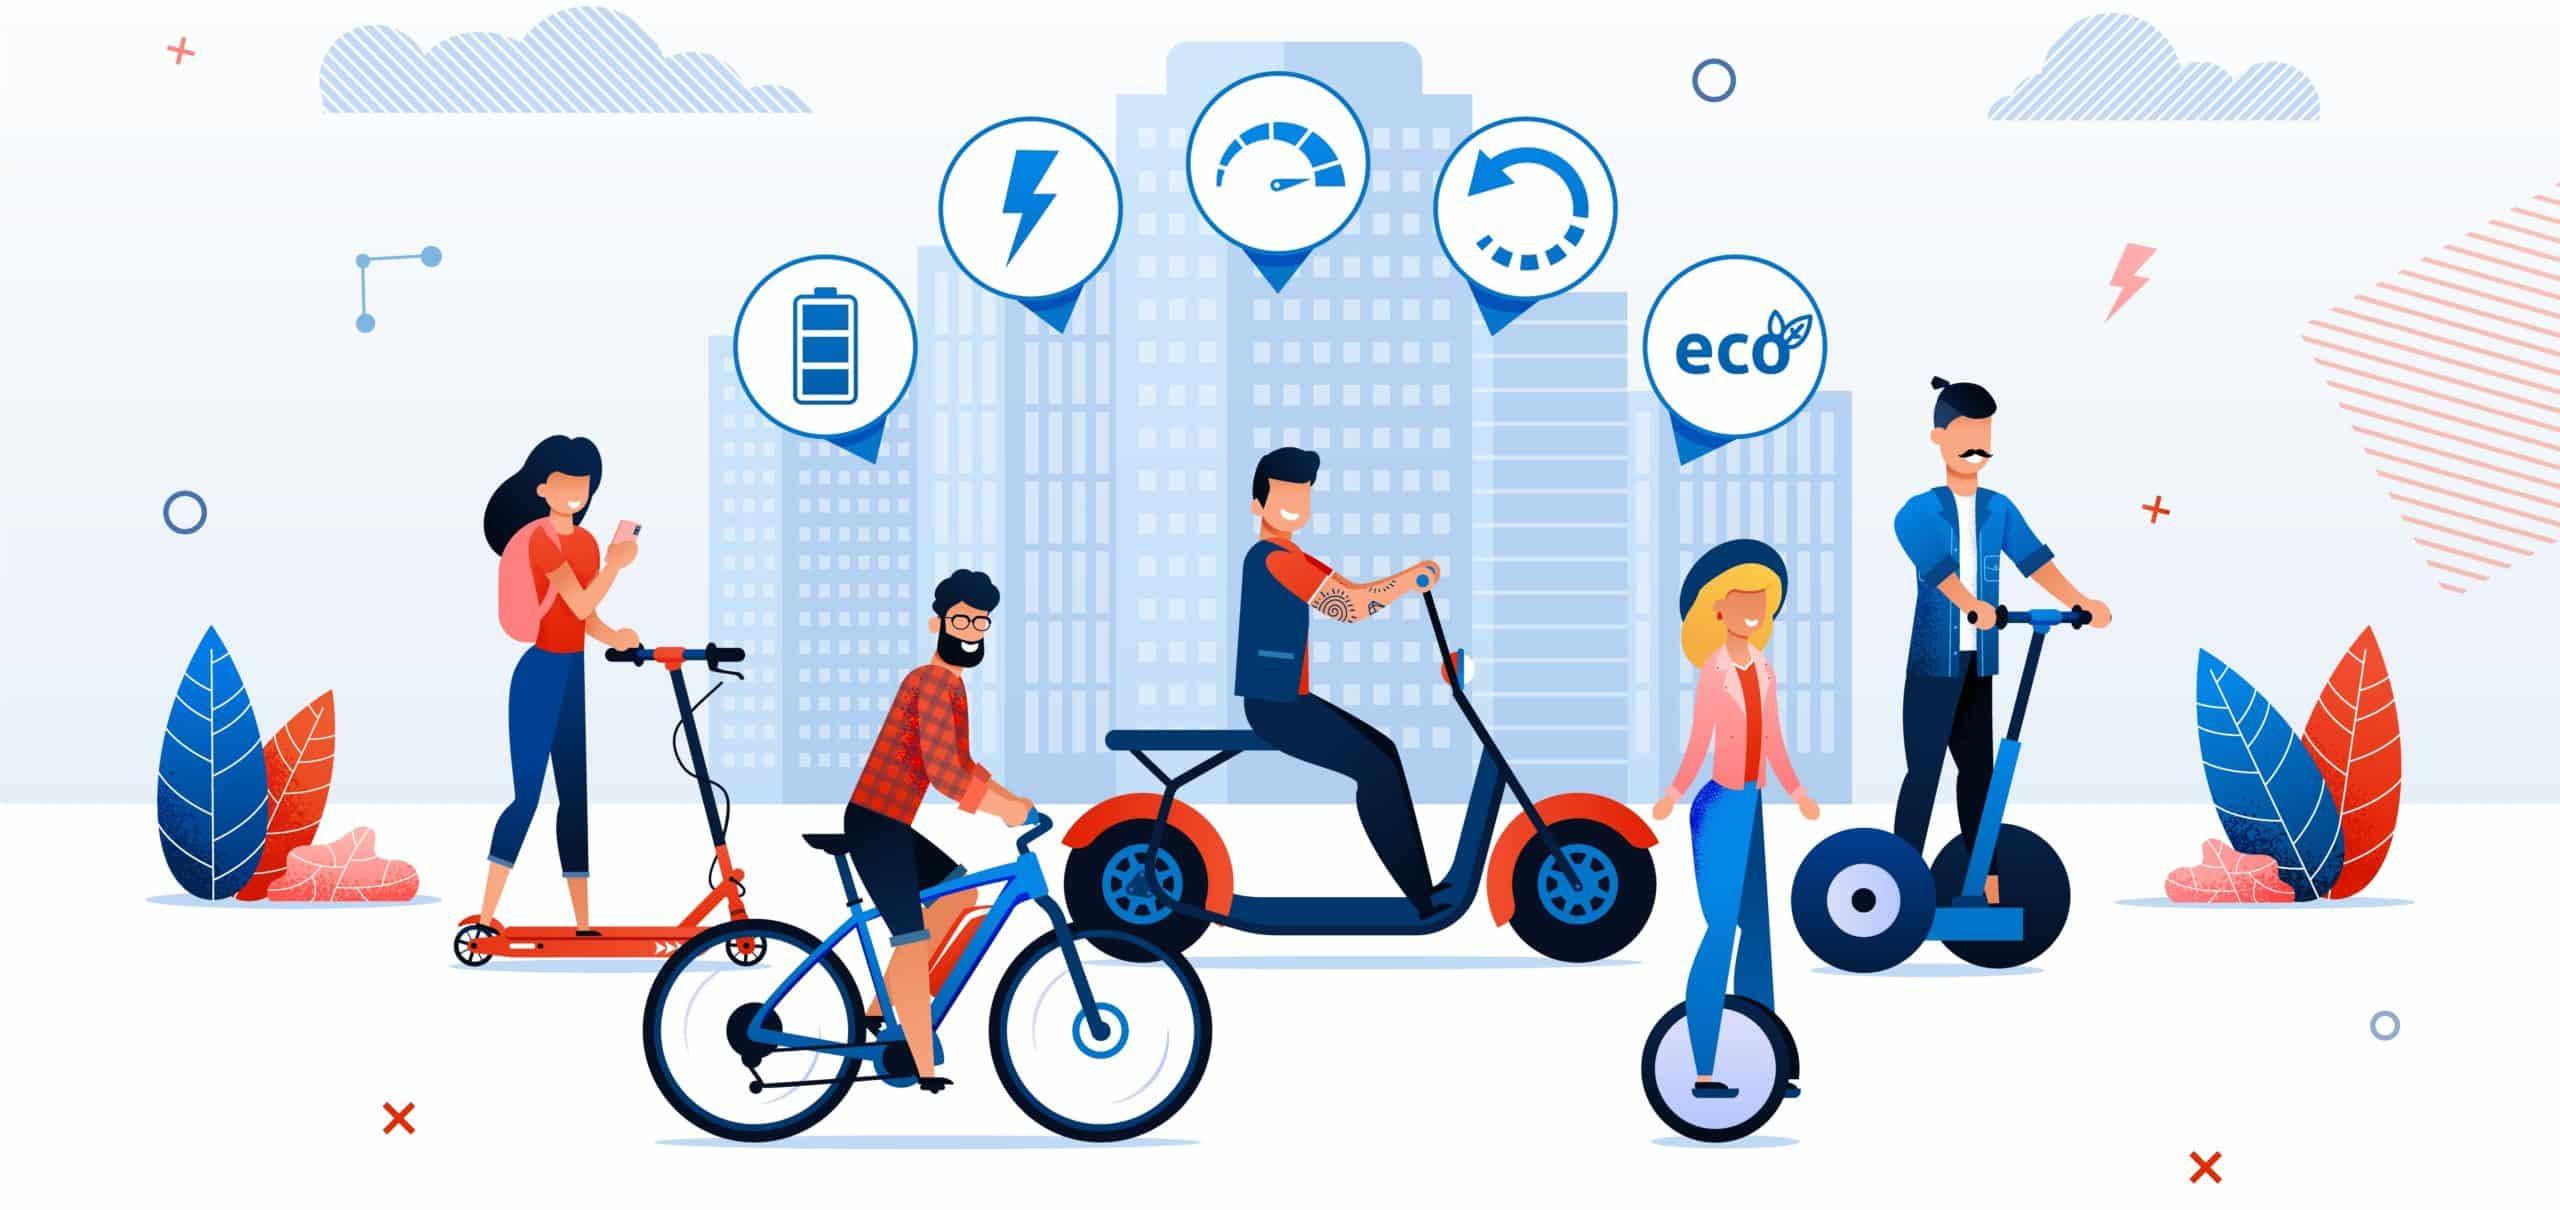 Man Woman Ride Electro Bike Bicycle Scooter Segway